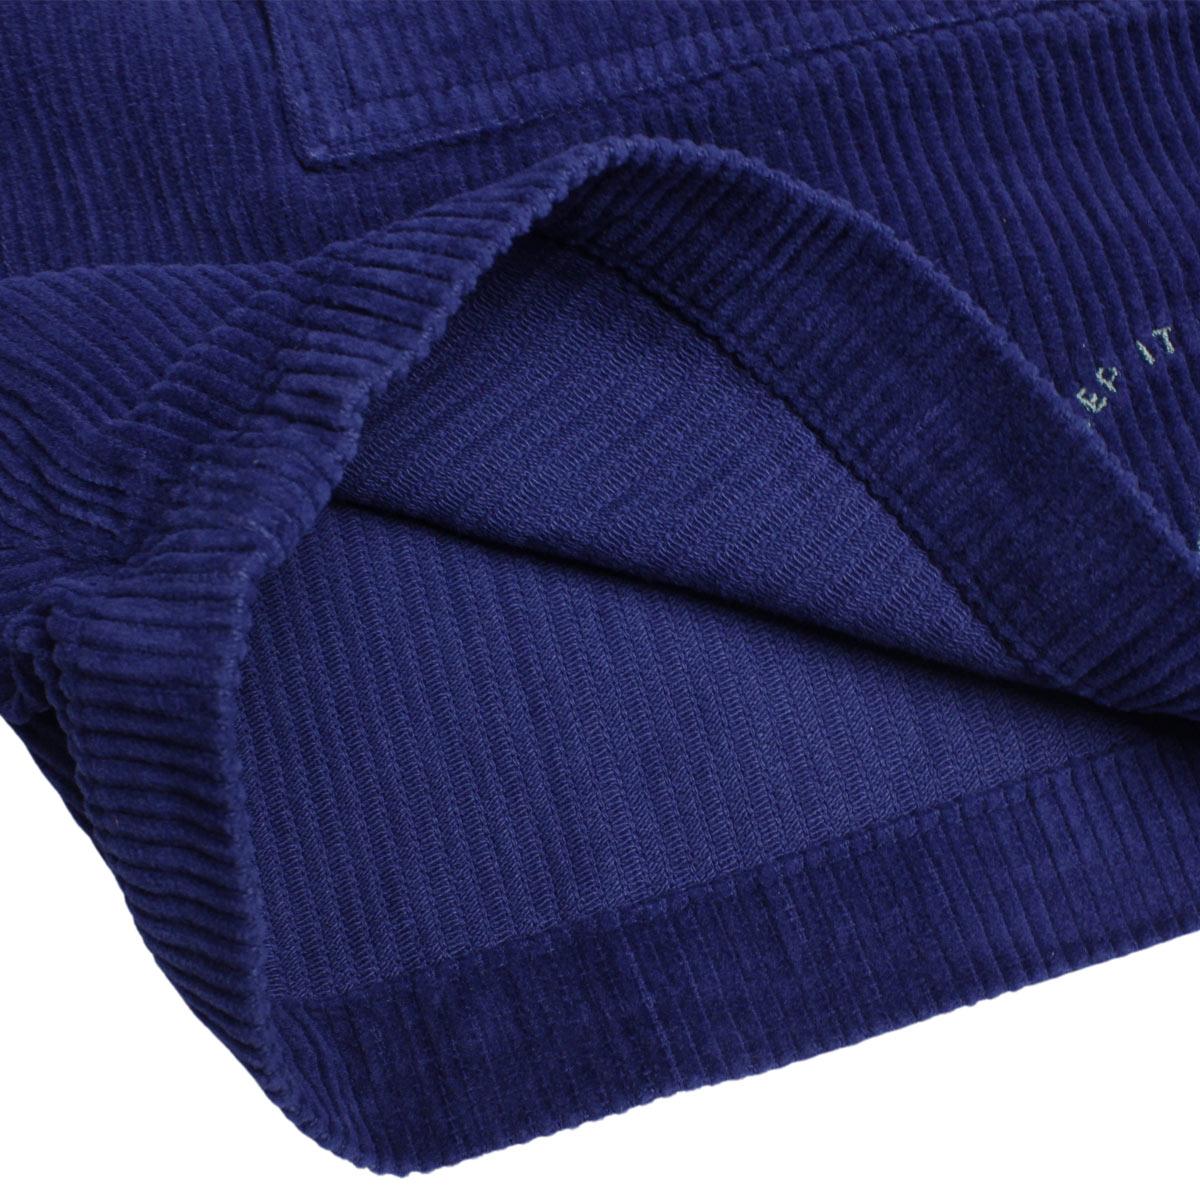 Almond Surf アーモンドサーフボードデザイン KEEP IT SIMPLE CORDUROY PANTS